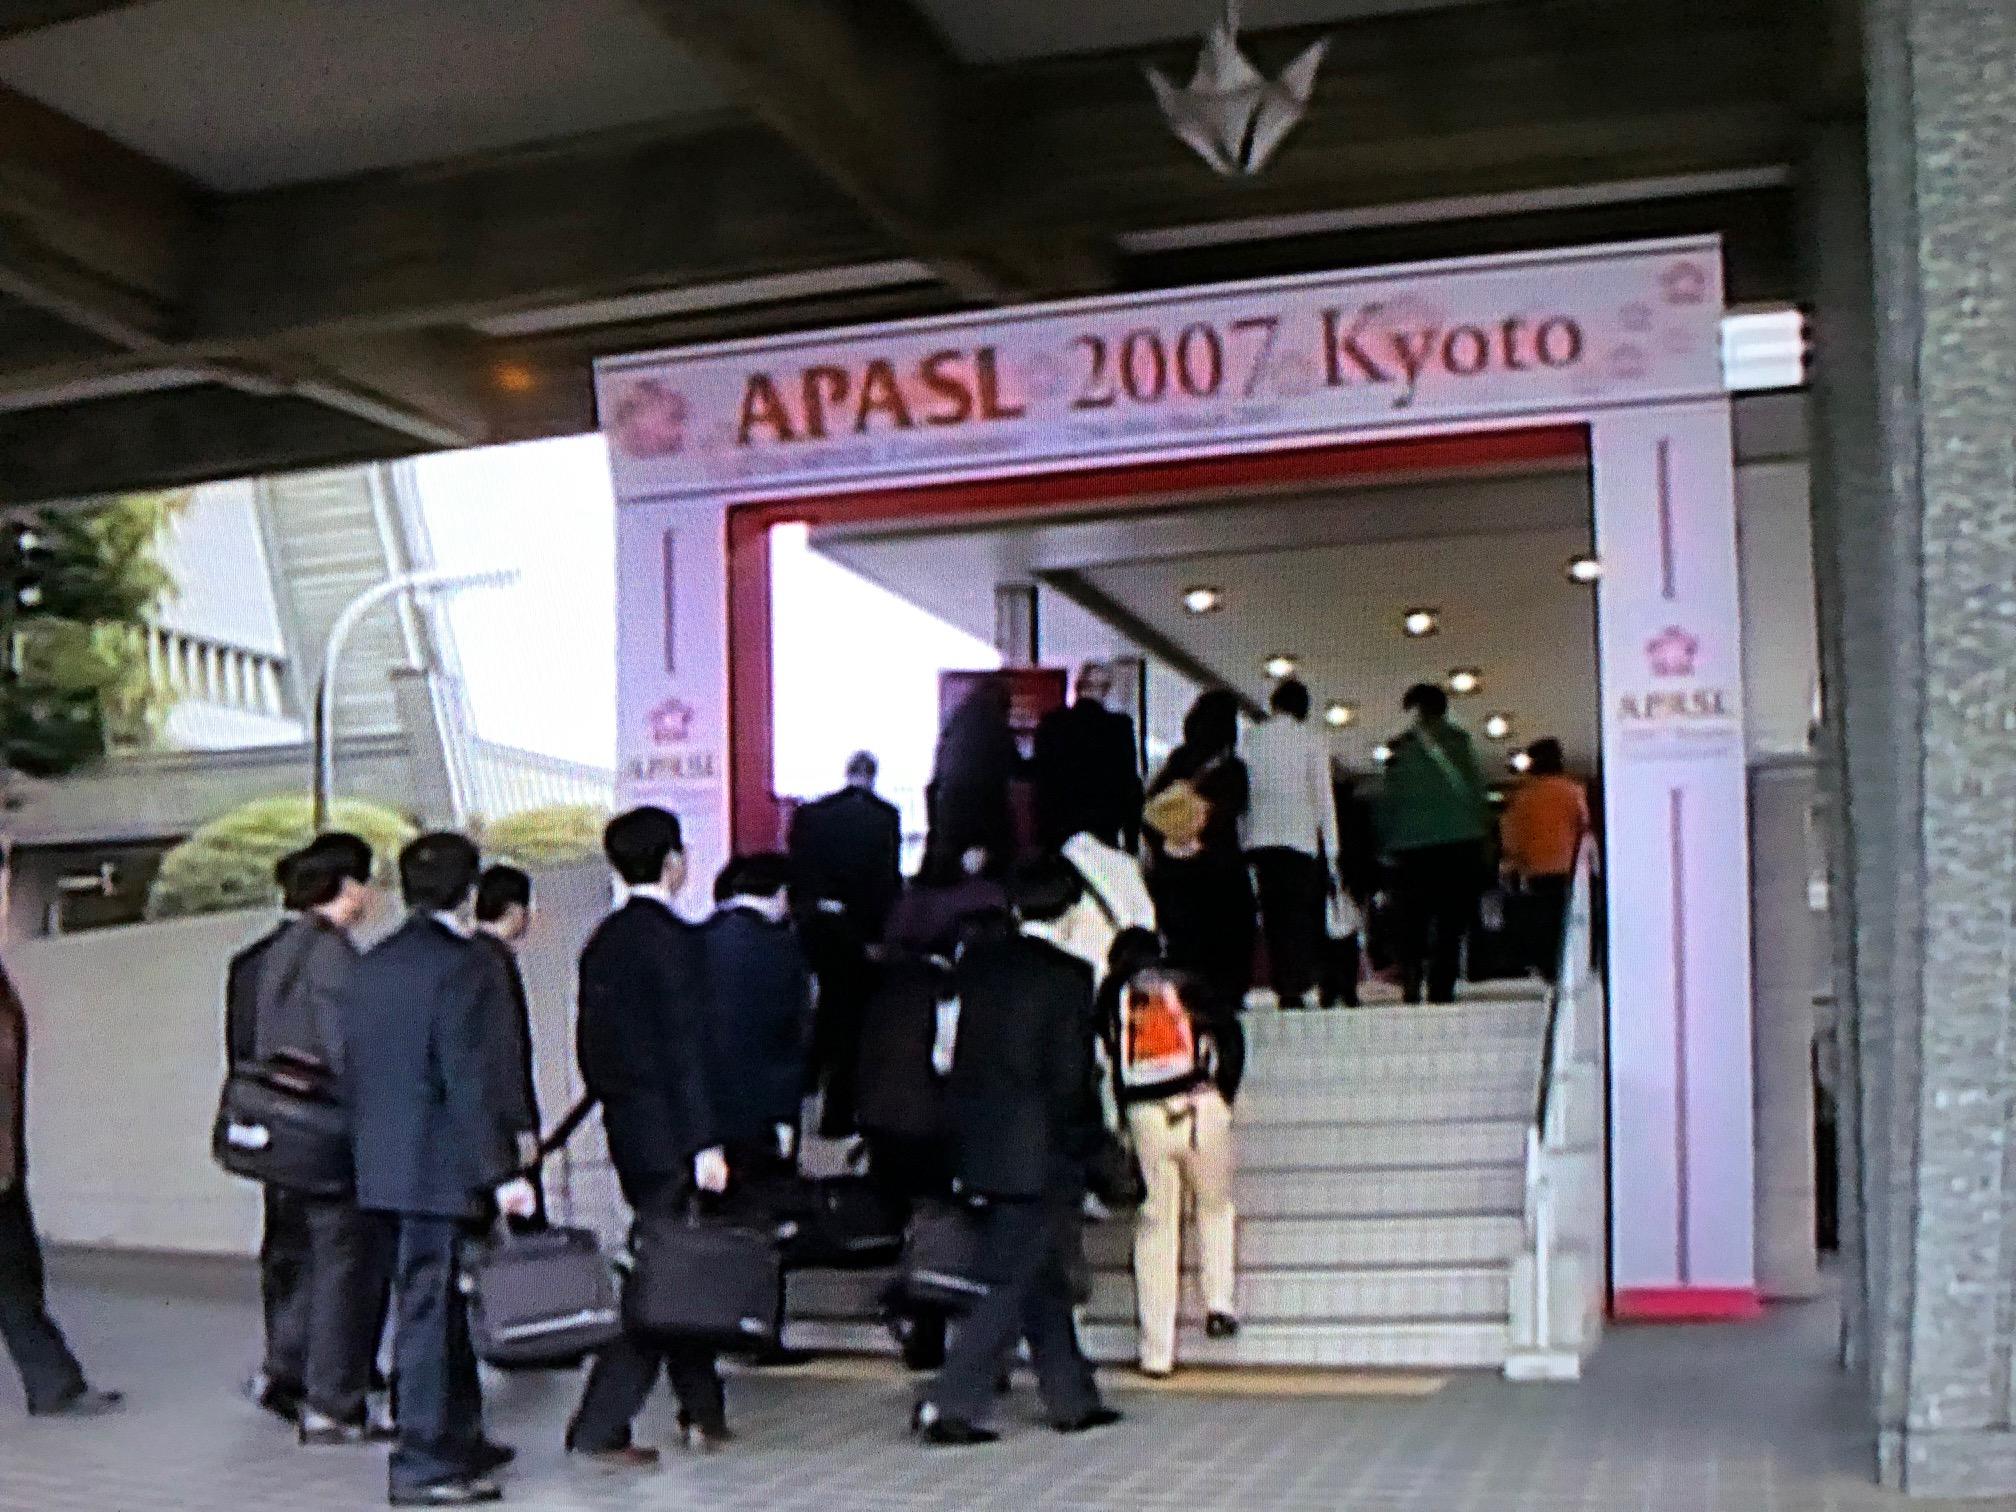 apasl2007_Kyoto02